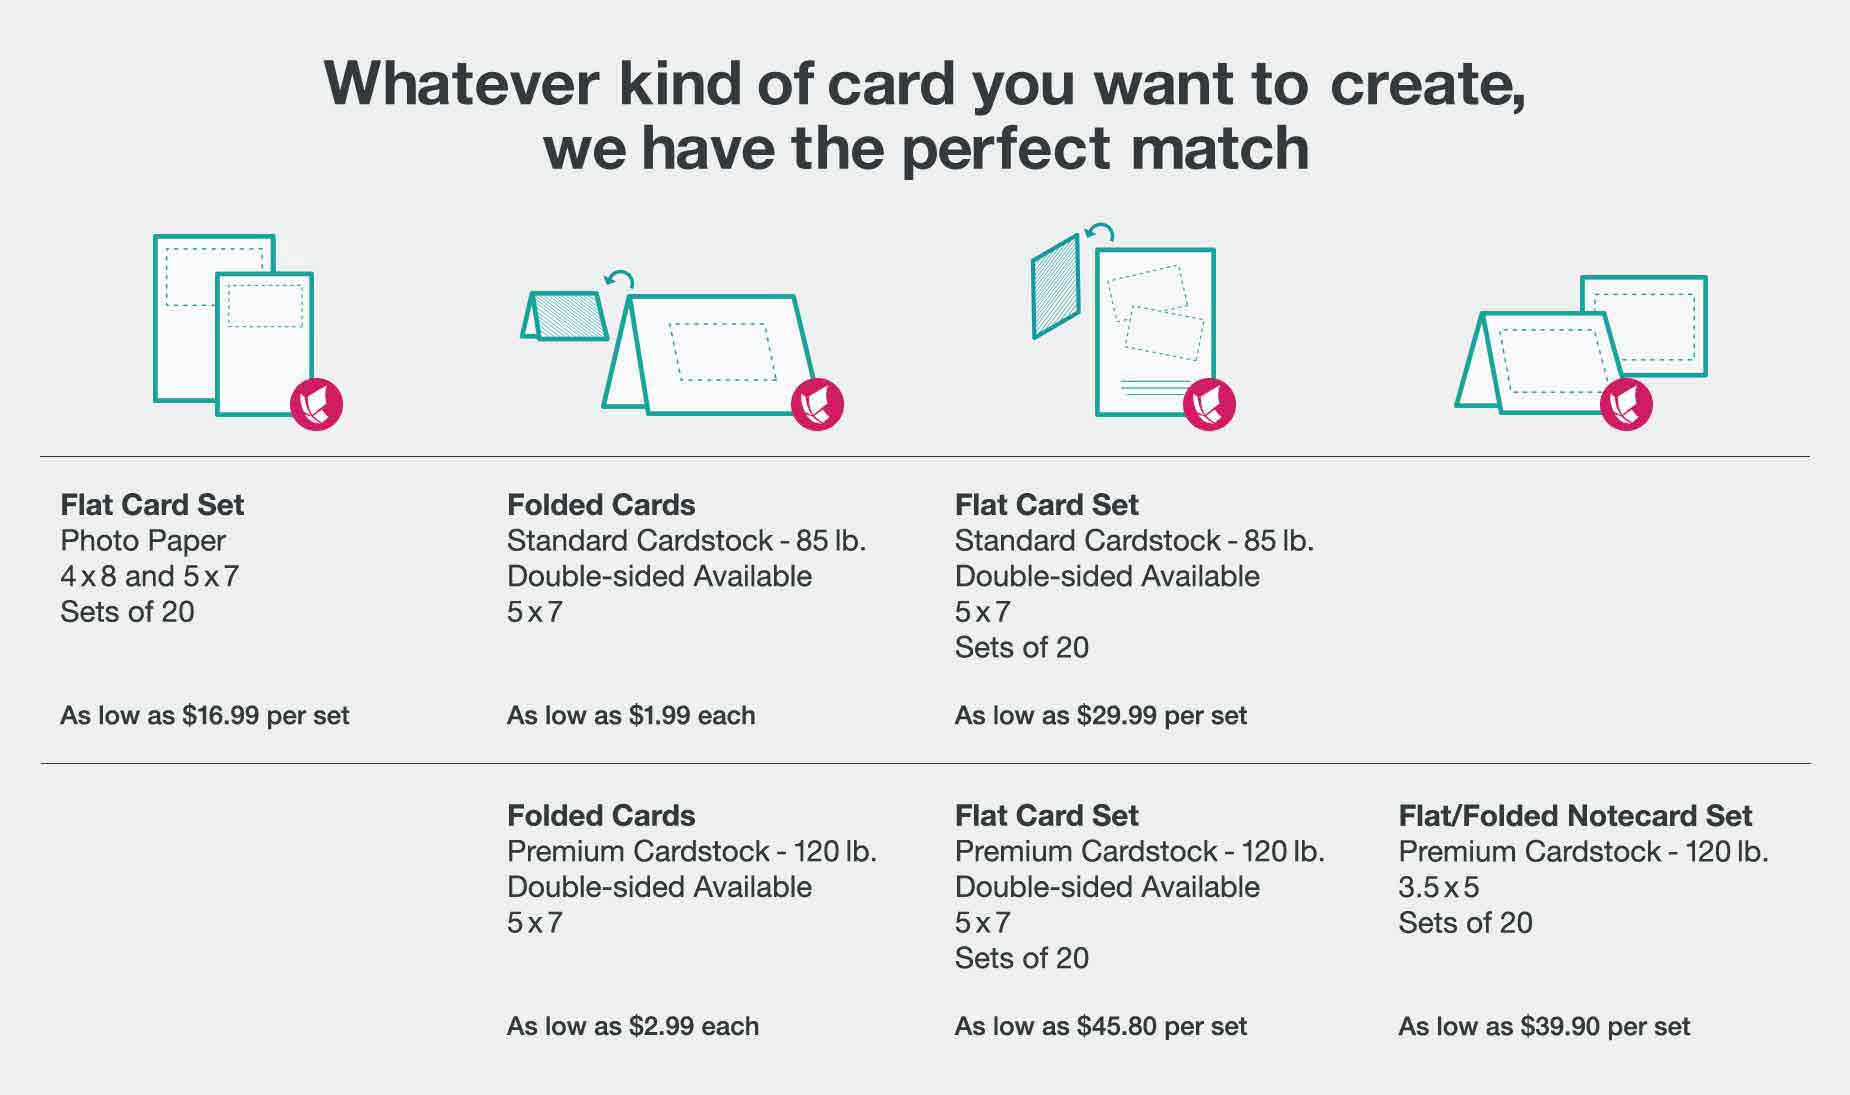 Cards Create Customized Cards